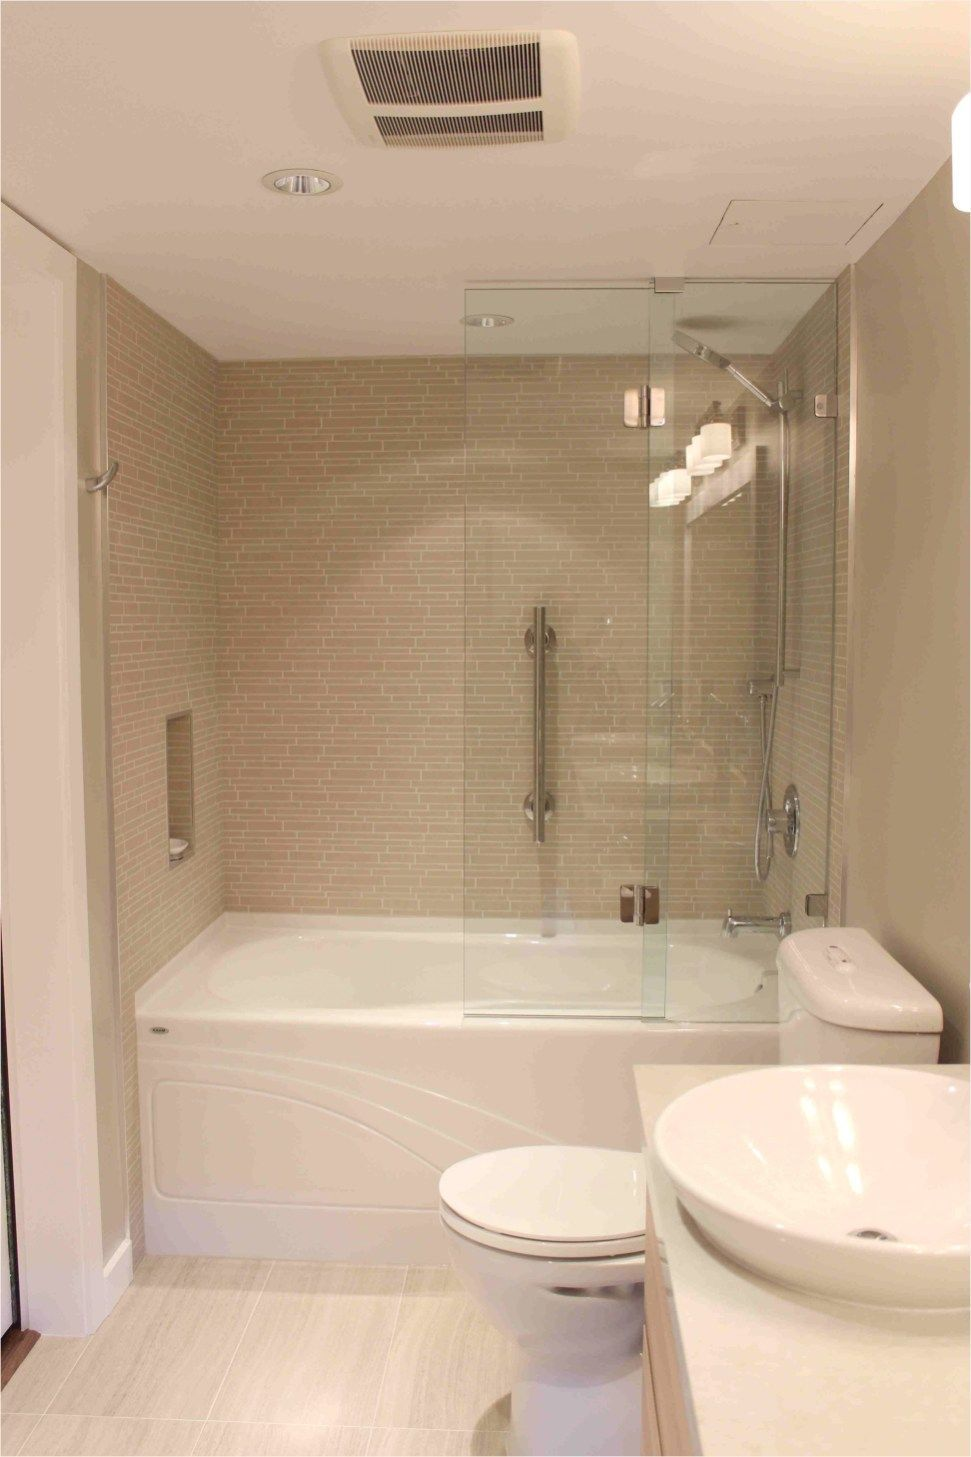 Full Bathroom Renovation 41 Awesome Small Full Bathroom Remodel